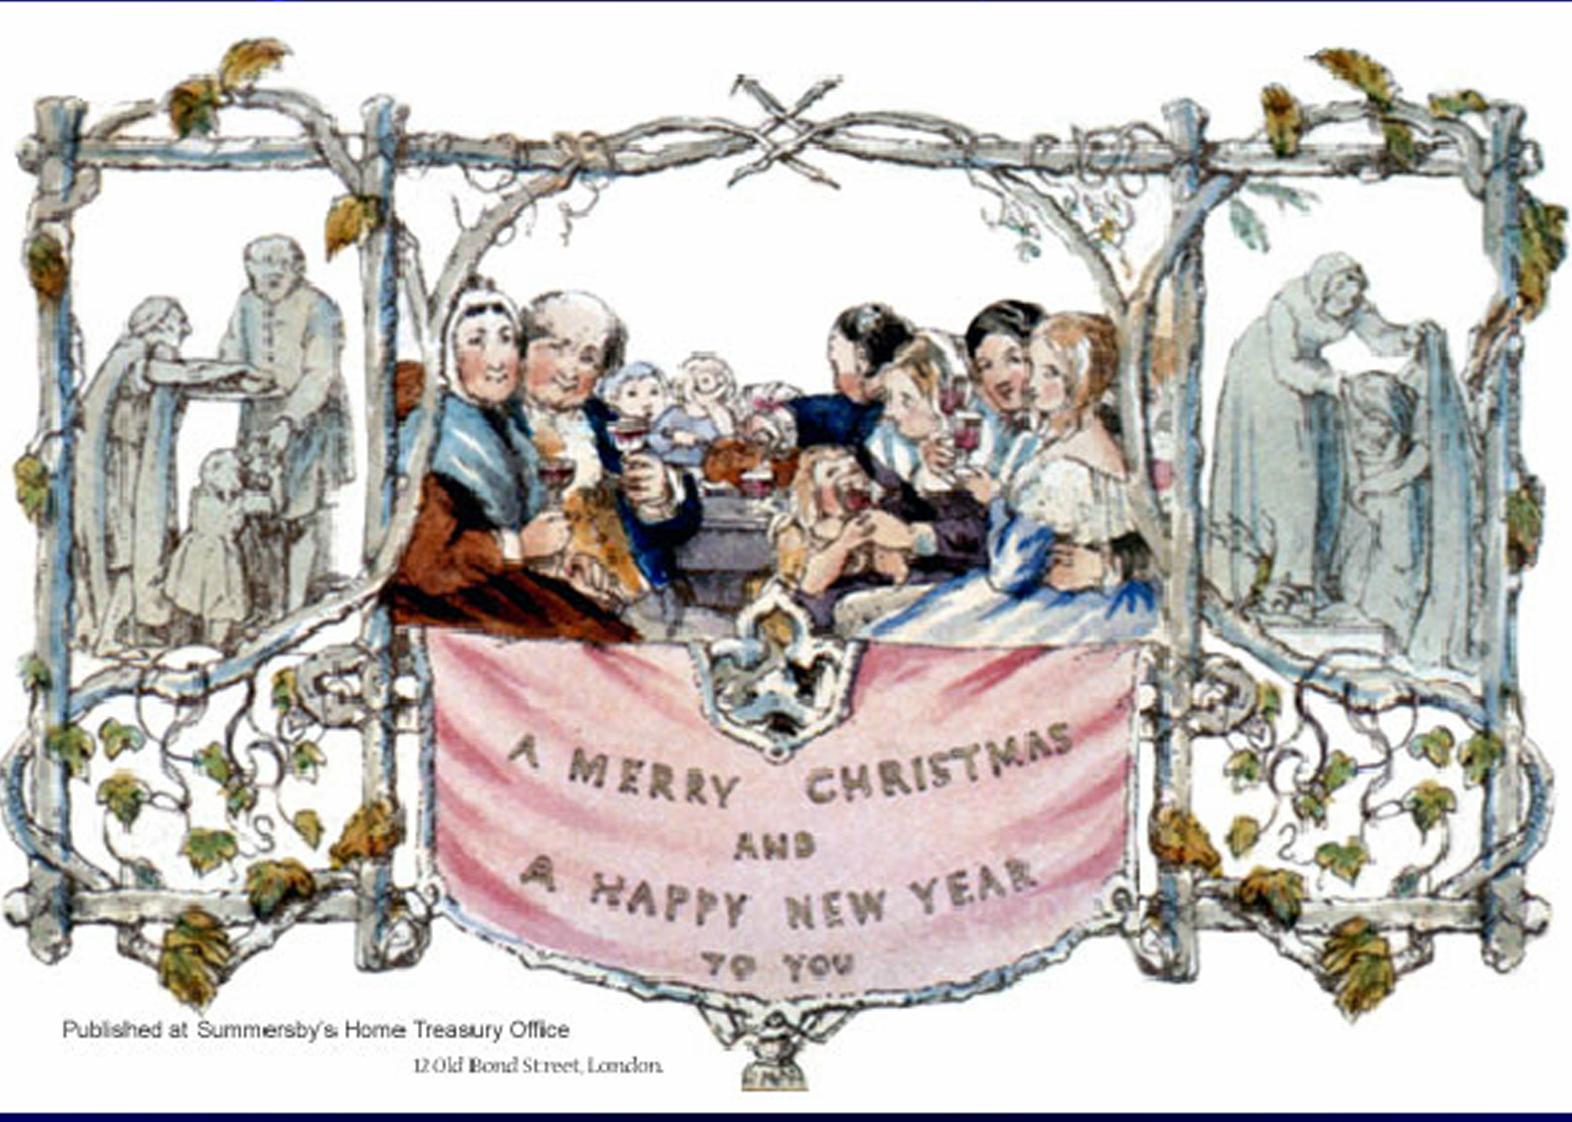 The traditions of Christmas > Joint Base Elmendorf-Richardson > News